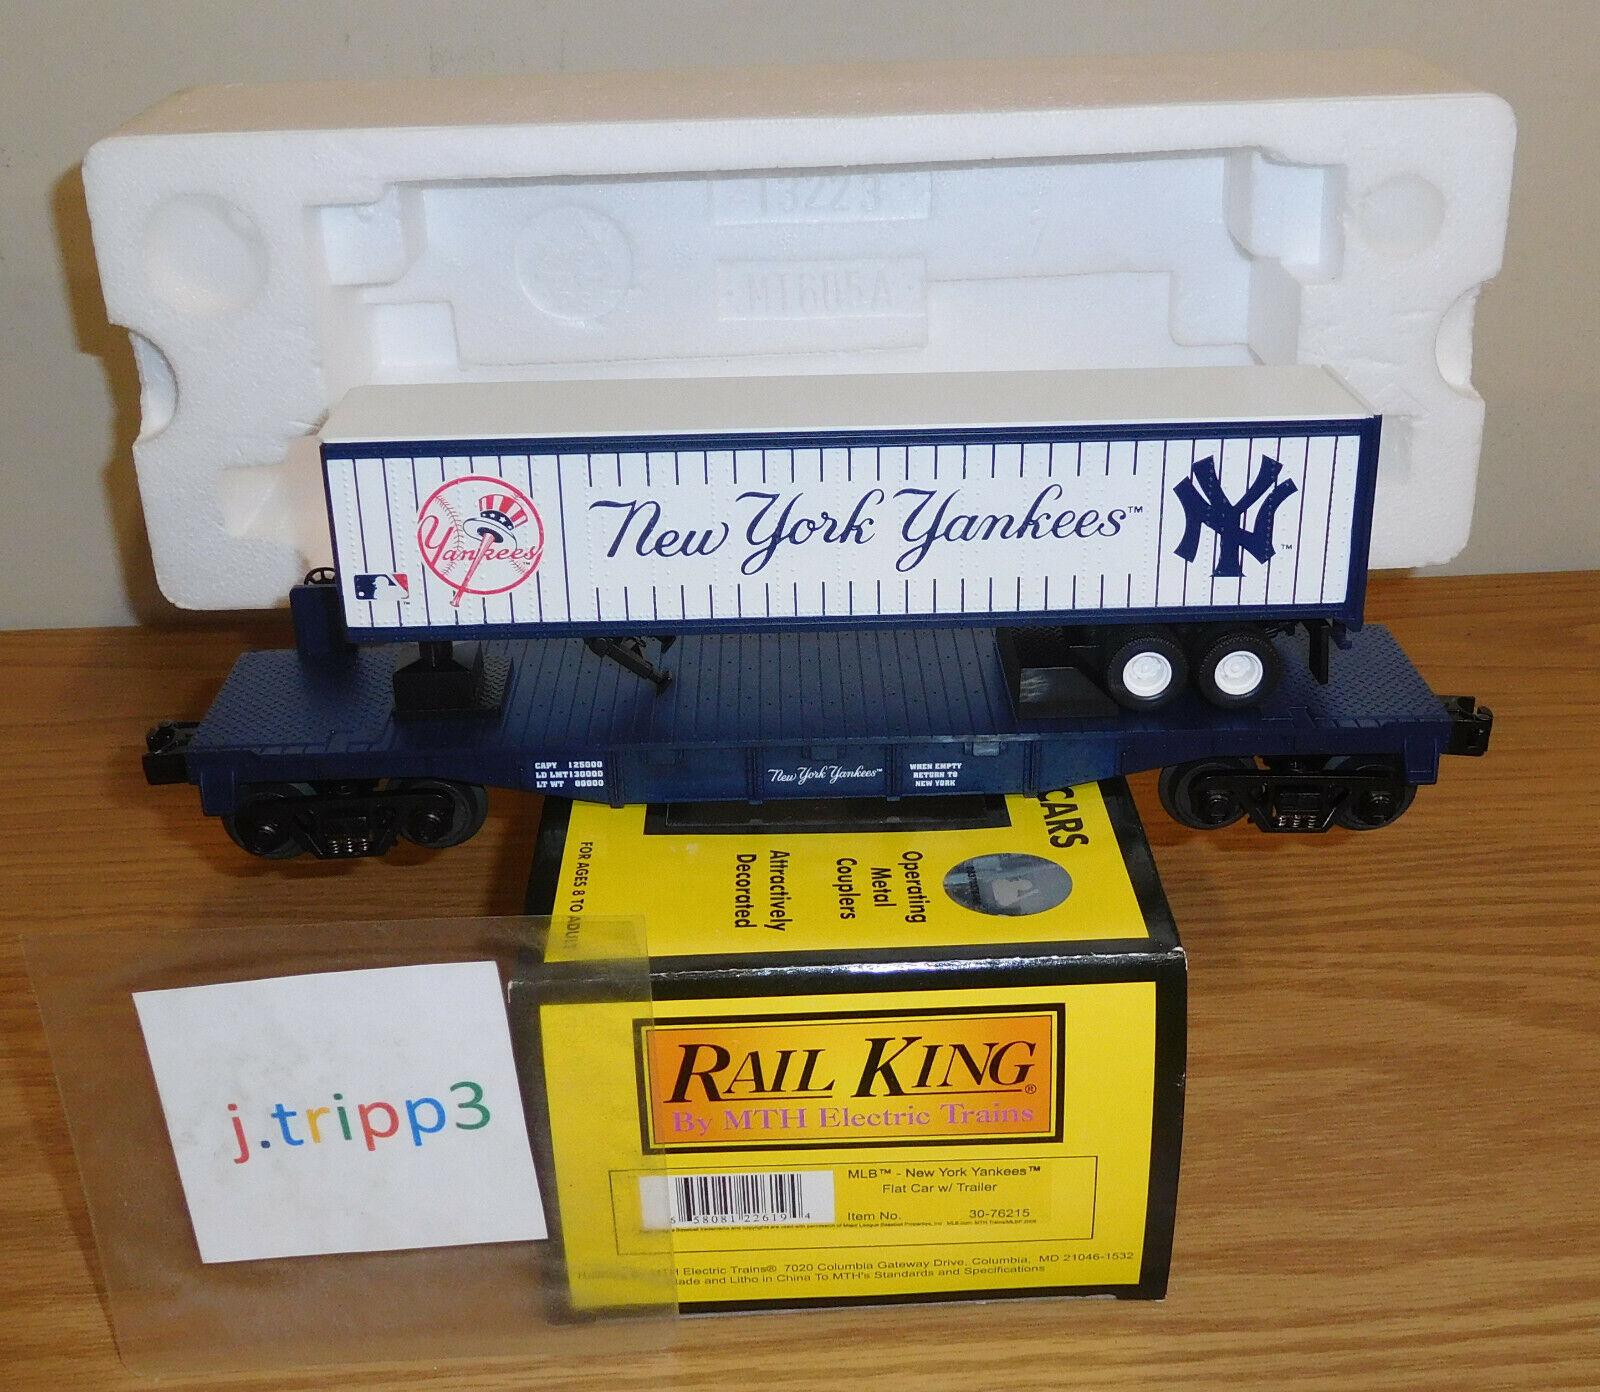 MTH 30-76215 NEW YORK YANKEES BASEBALL FLAT CAR w TRAILER O GAUGE TRAIN RAILKING